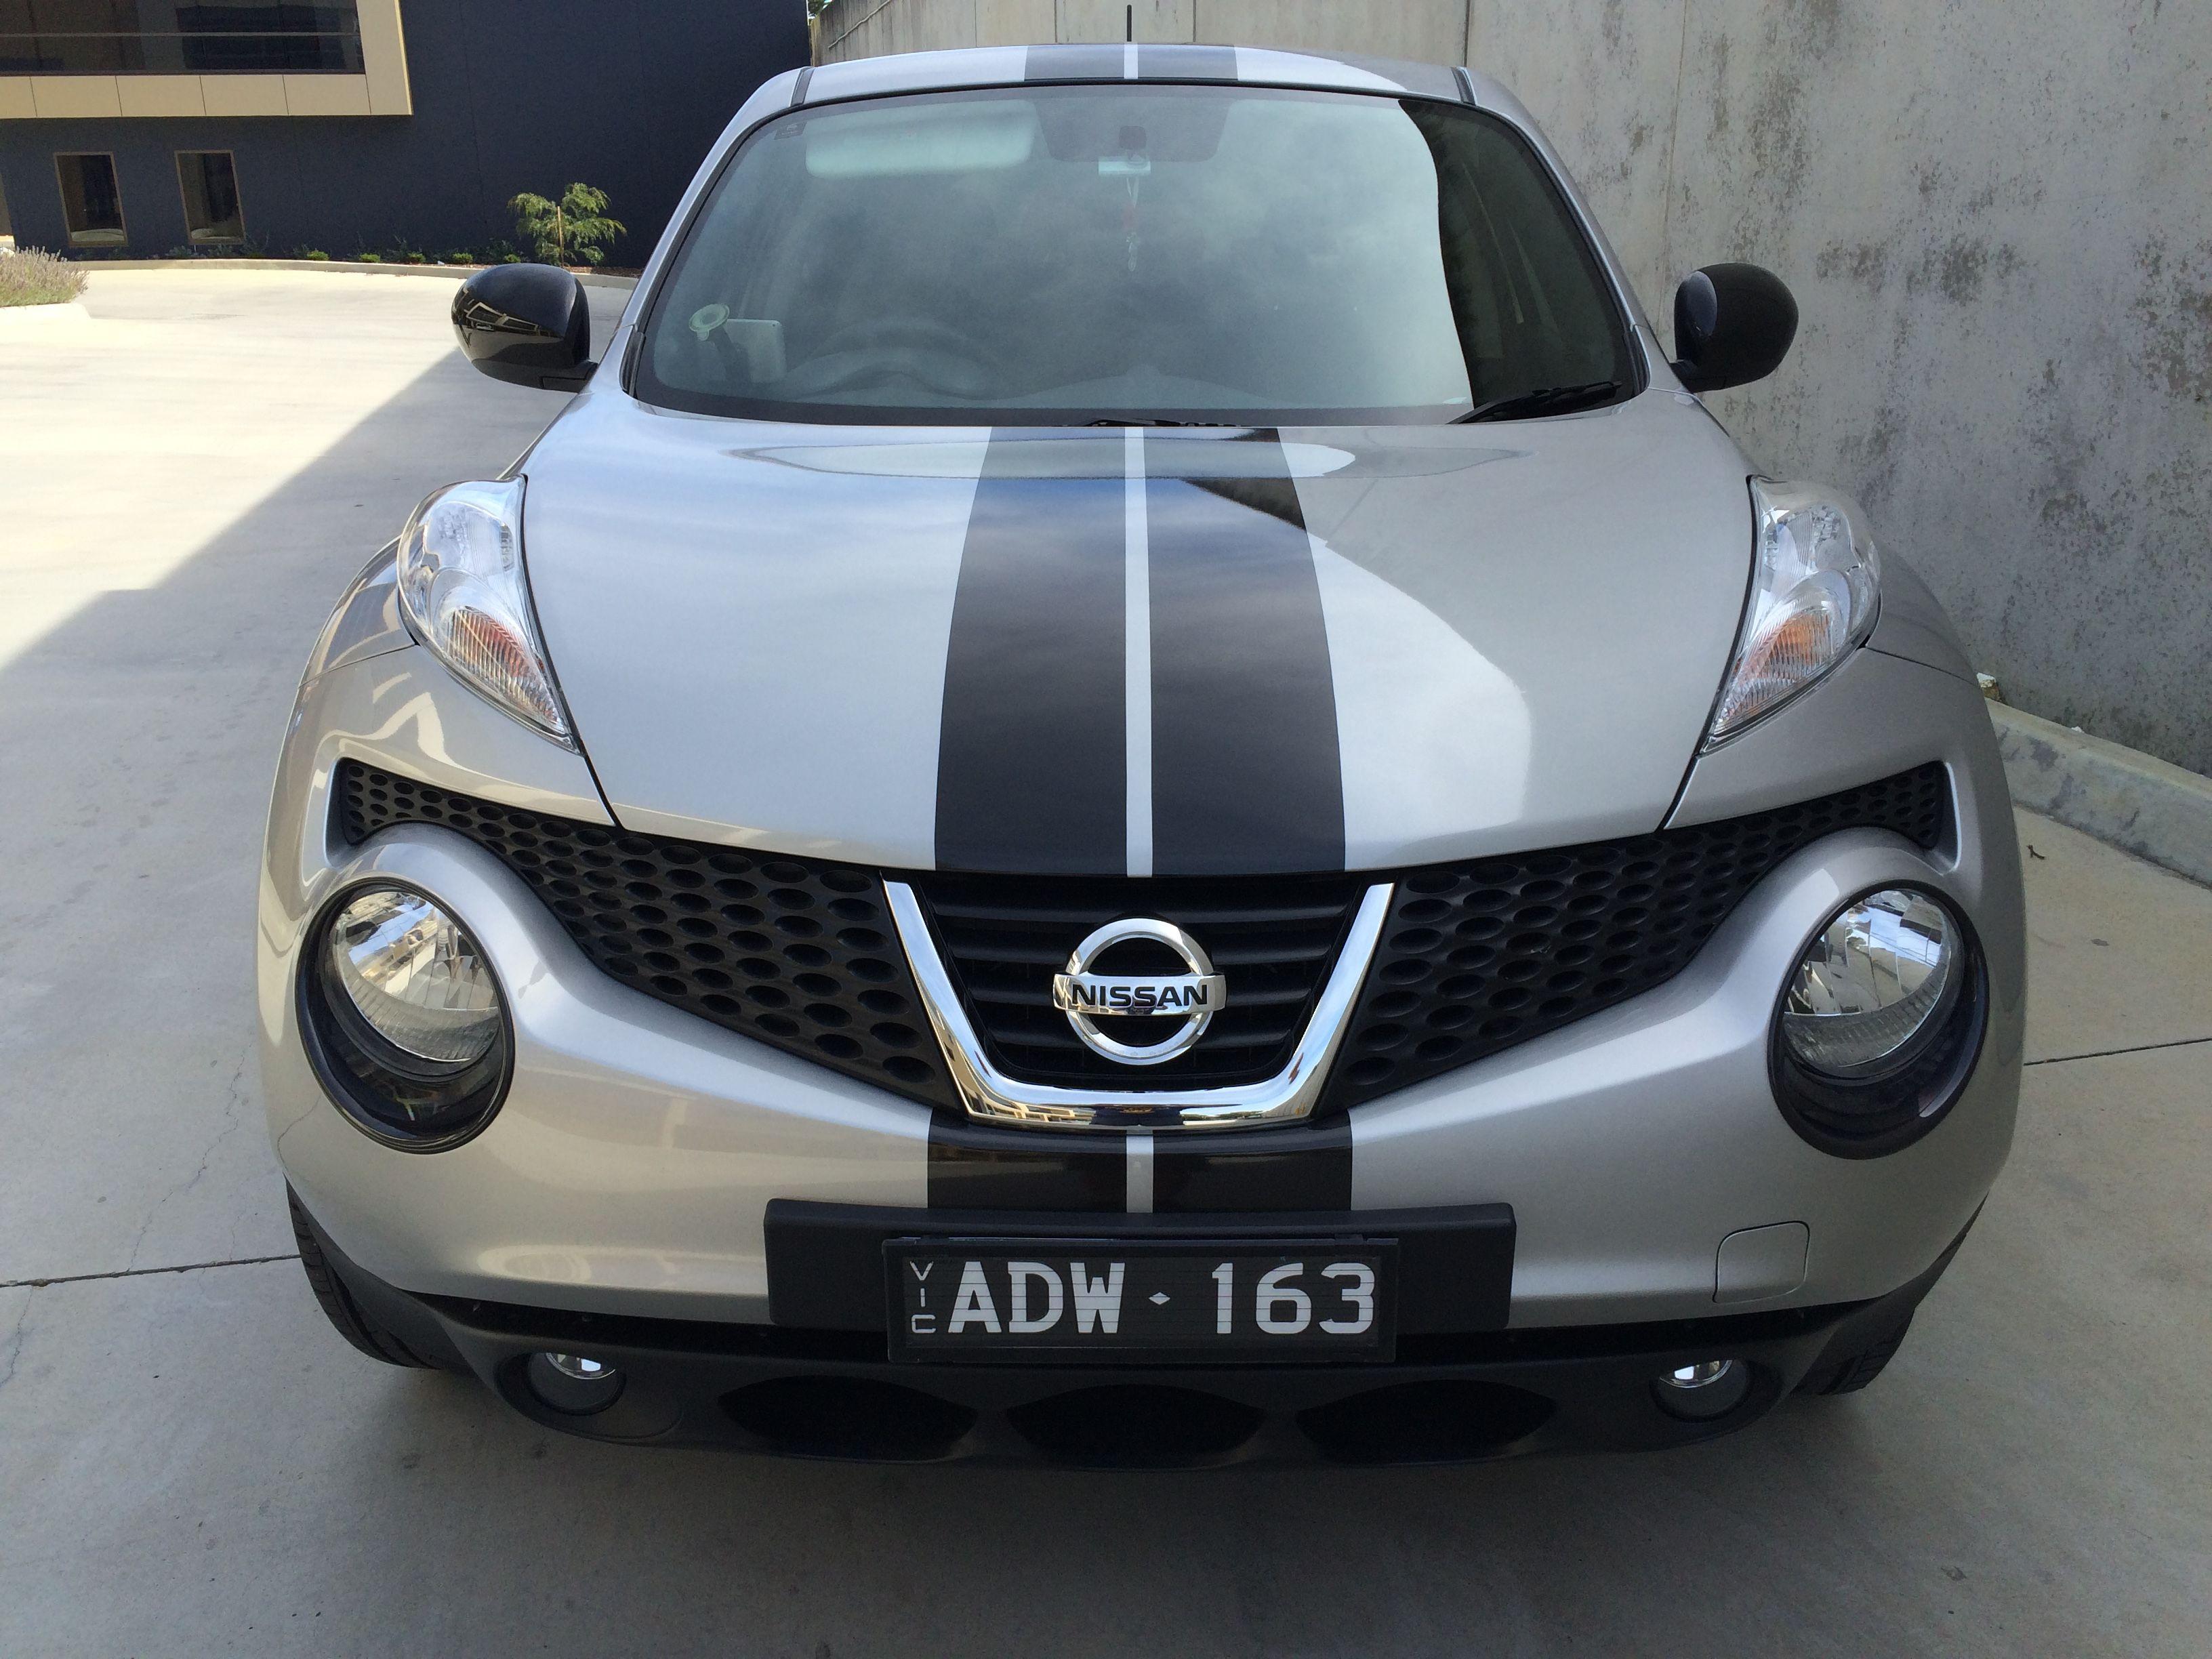 Nissan Juke Custom Made Black Stripes Supplied Installed By Sign Dazign Melbourne Australia Nissan Juke Nissan Unique Cars